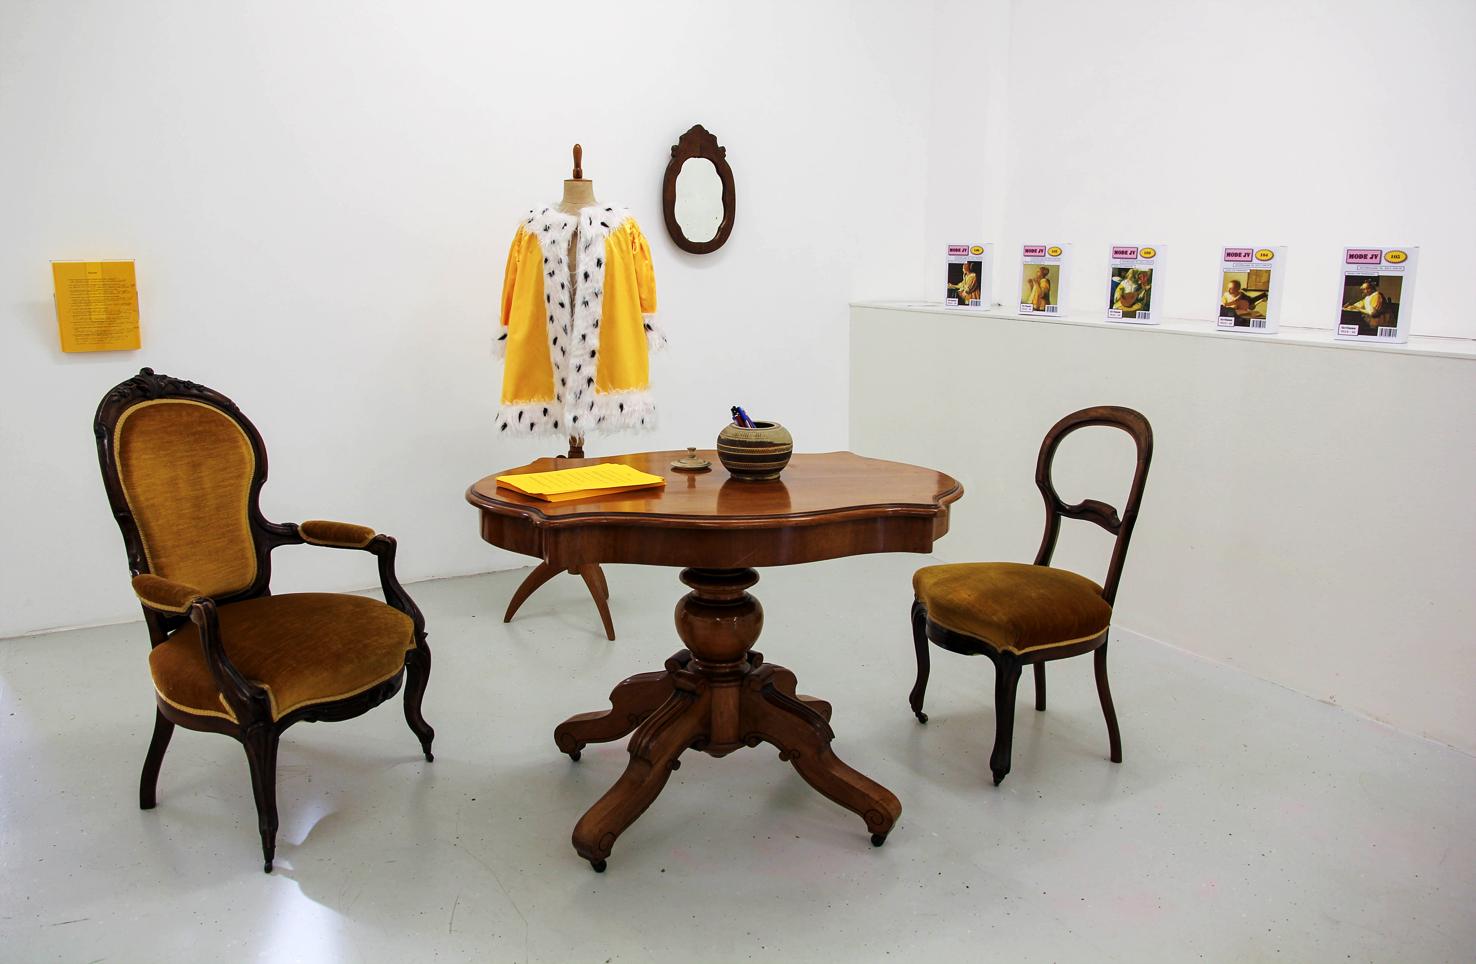 Patricia Jacomella, Ausstellungsansicht, Like You, 2014